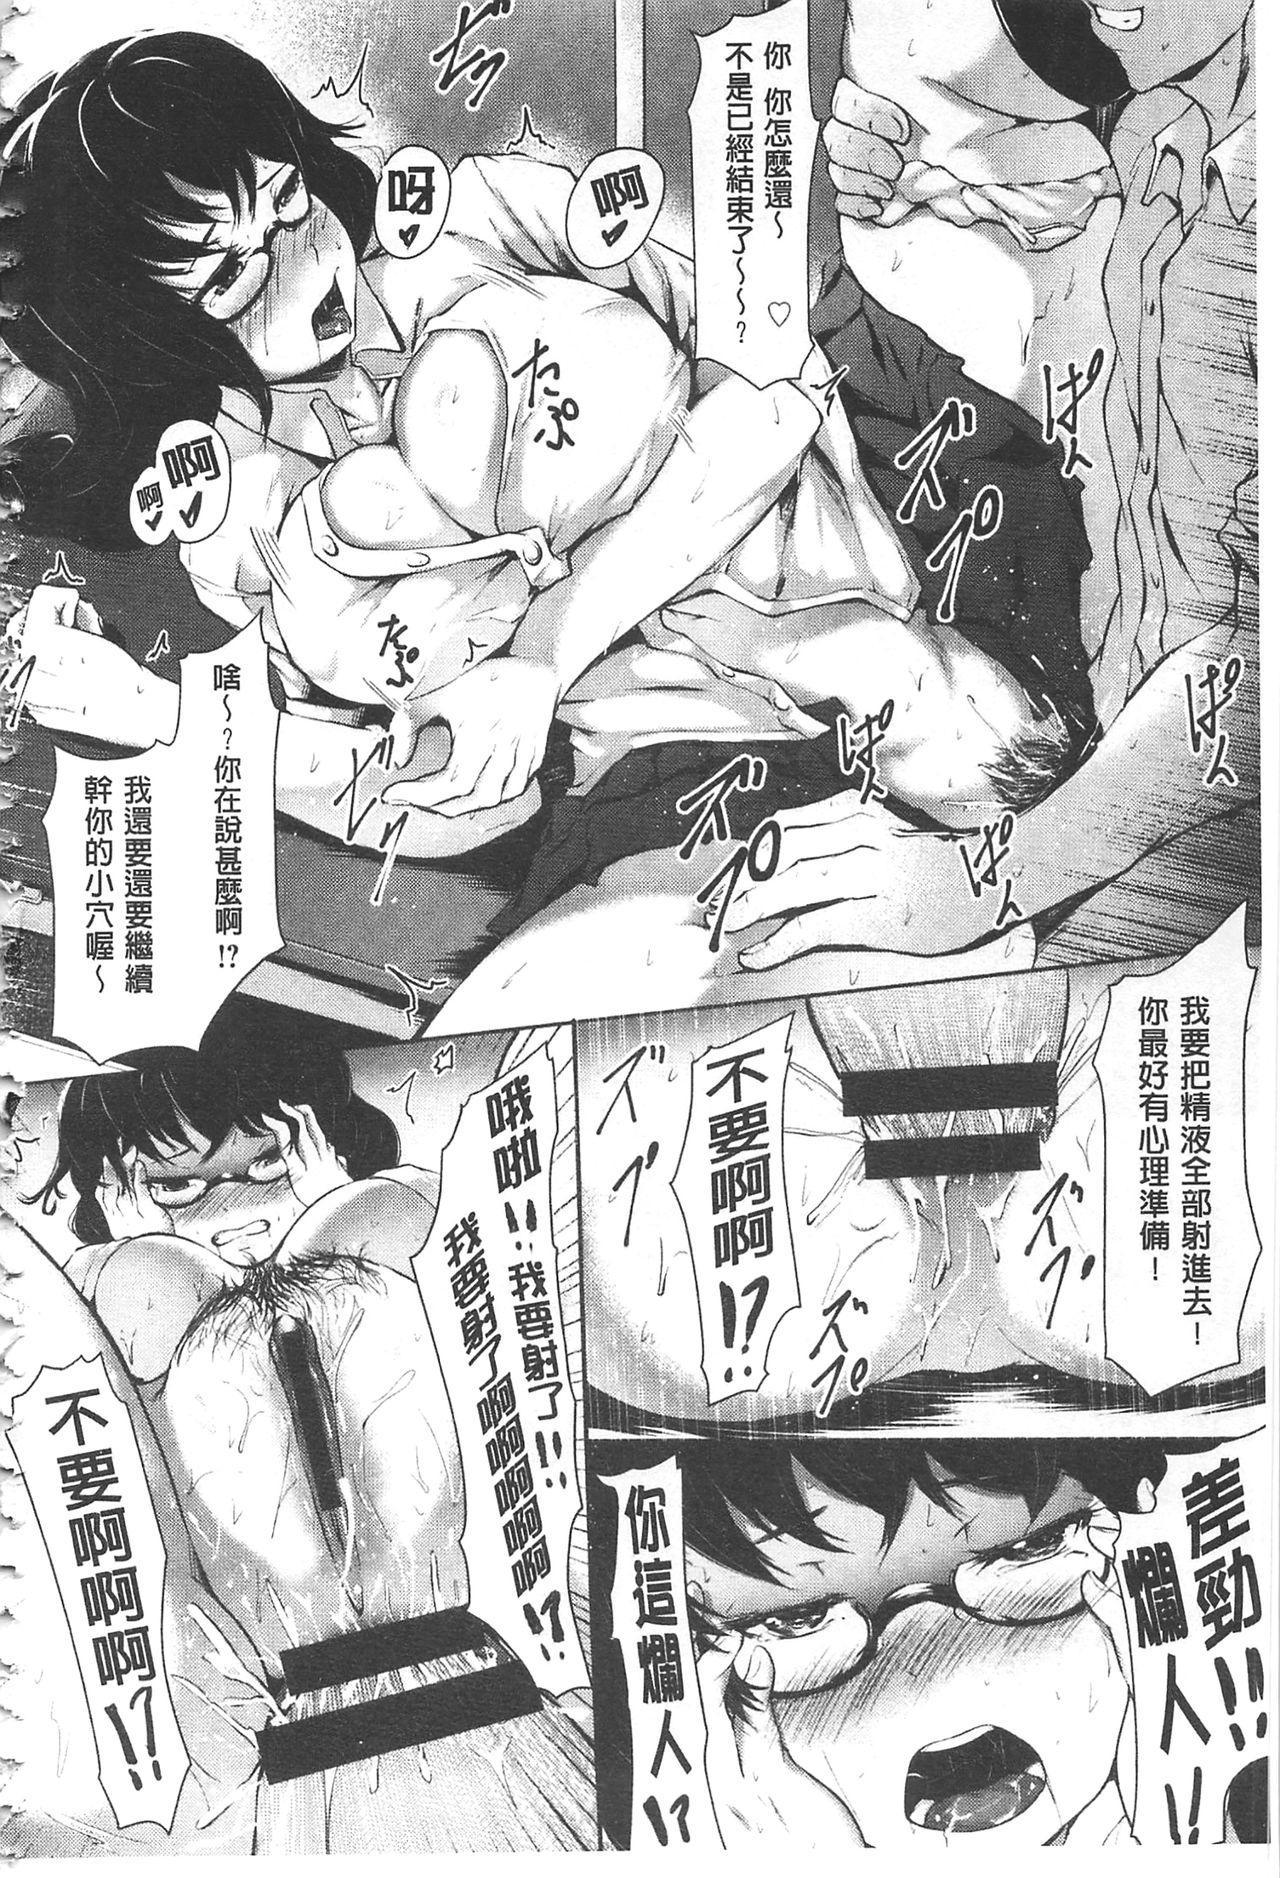 [Lorica] Biinkan Anal ~Kakusei Nejikomi Ana~ | 美淫感猥菊花 塞入擴張覺醒穴 [Chinese] 186